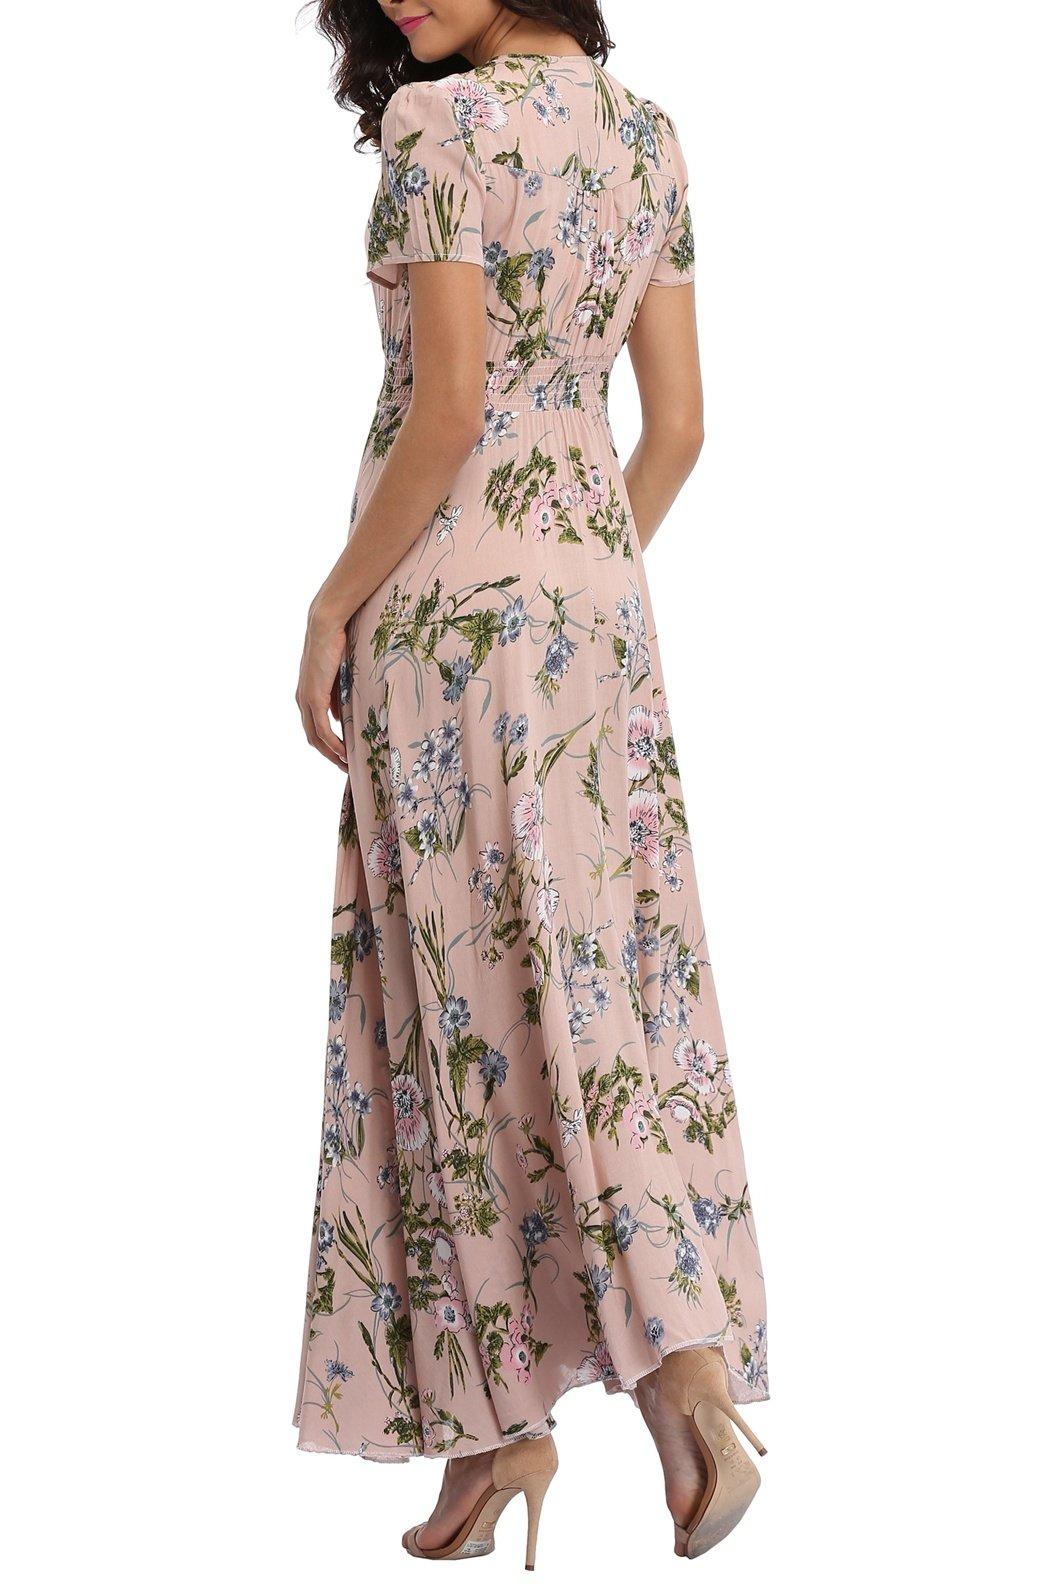 VintageClothing Women's Floral Print Maxi Dresses Boho Button Up Split Beach Party Dress,Pale Dogwood,Large by VintageClothing (Image #5)